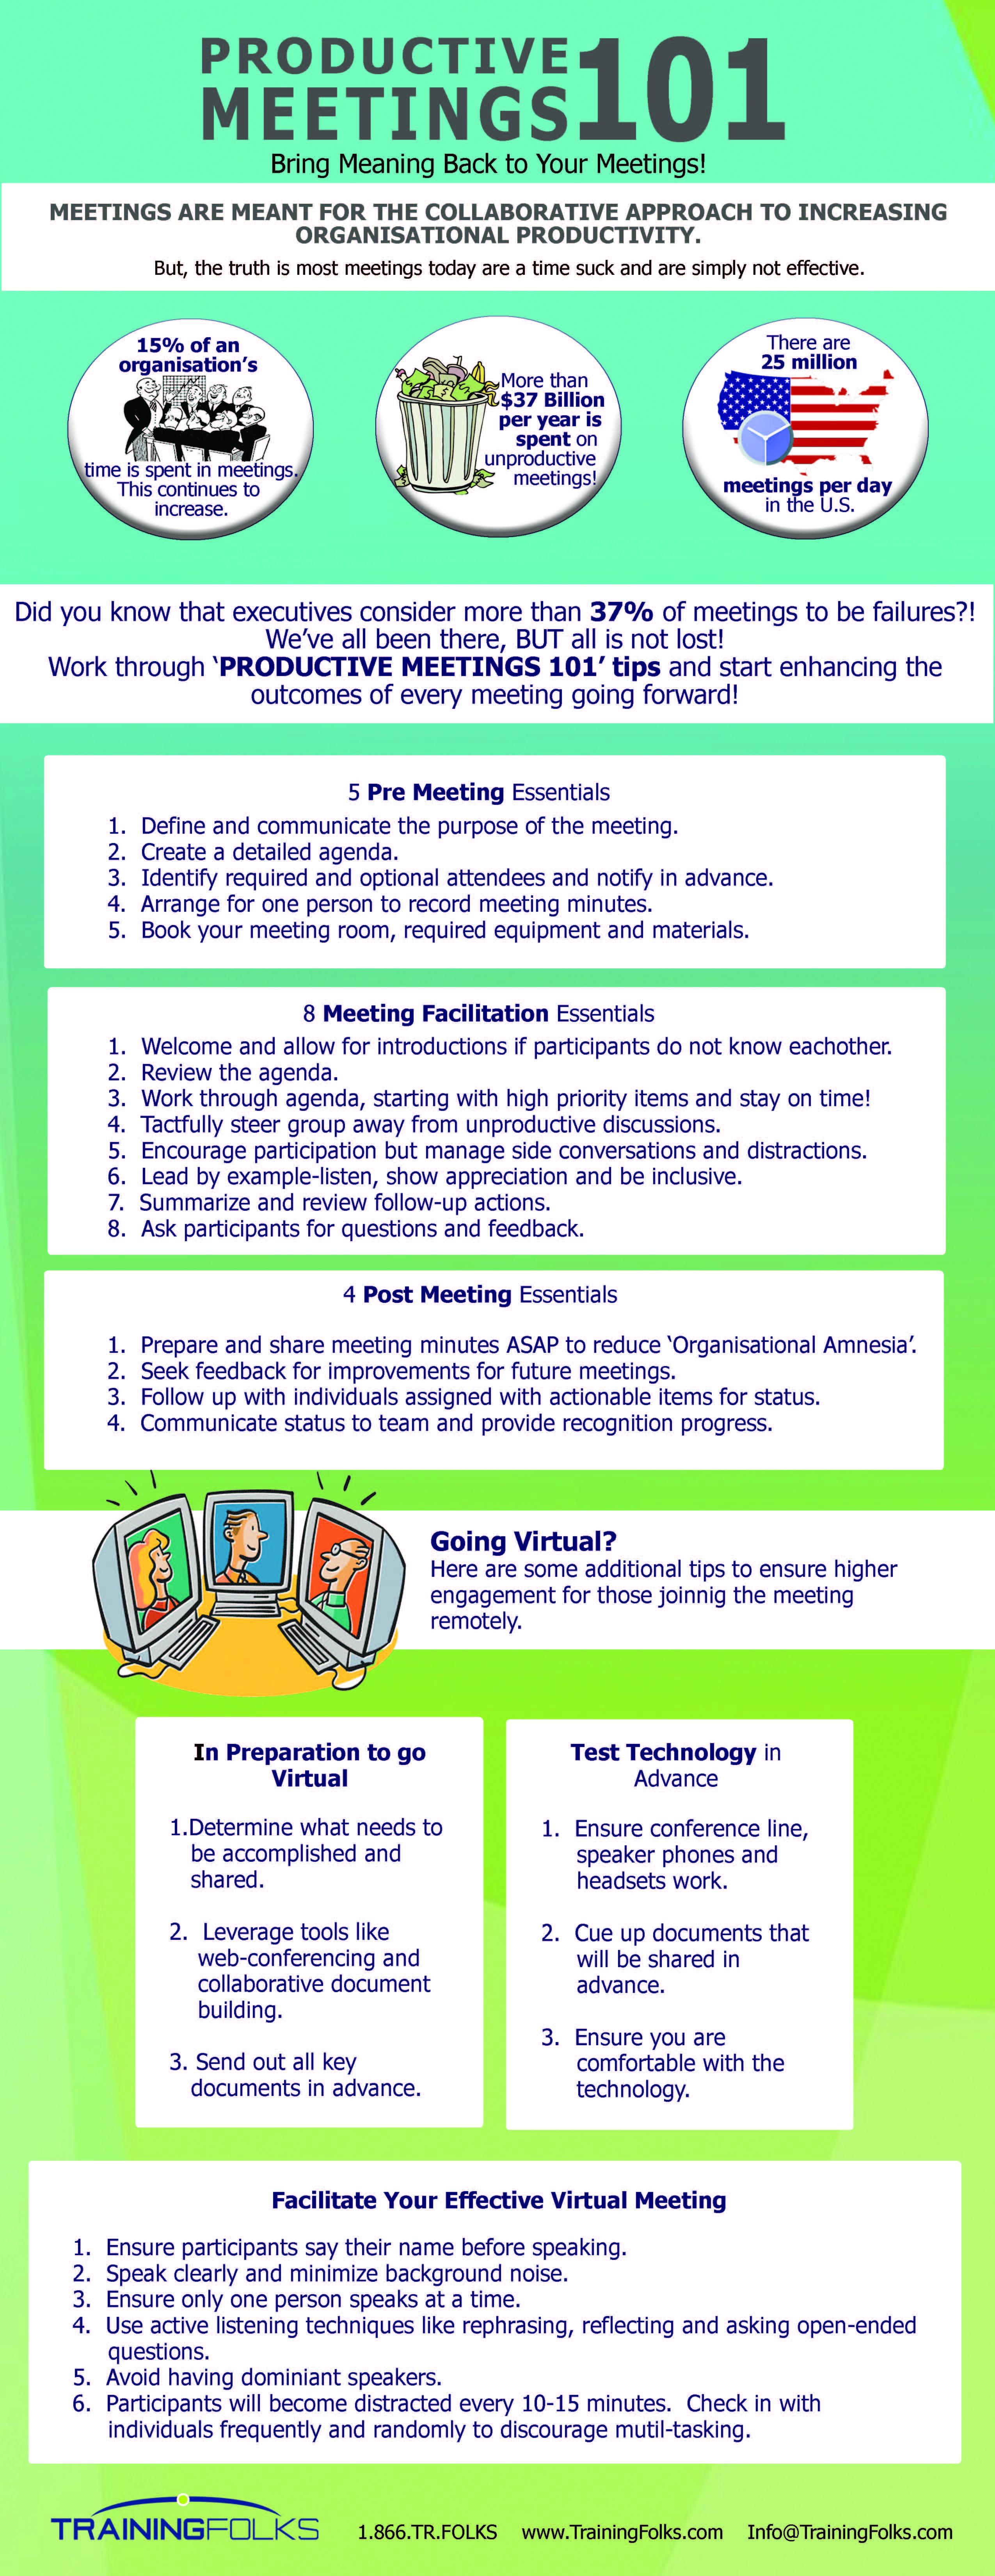 Effective-meetings-training-productive-meetings-101